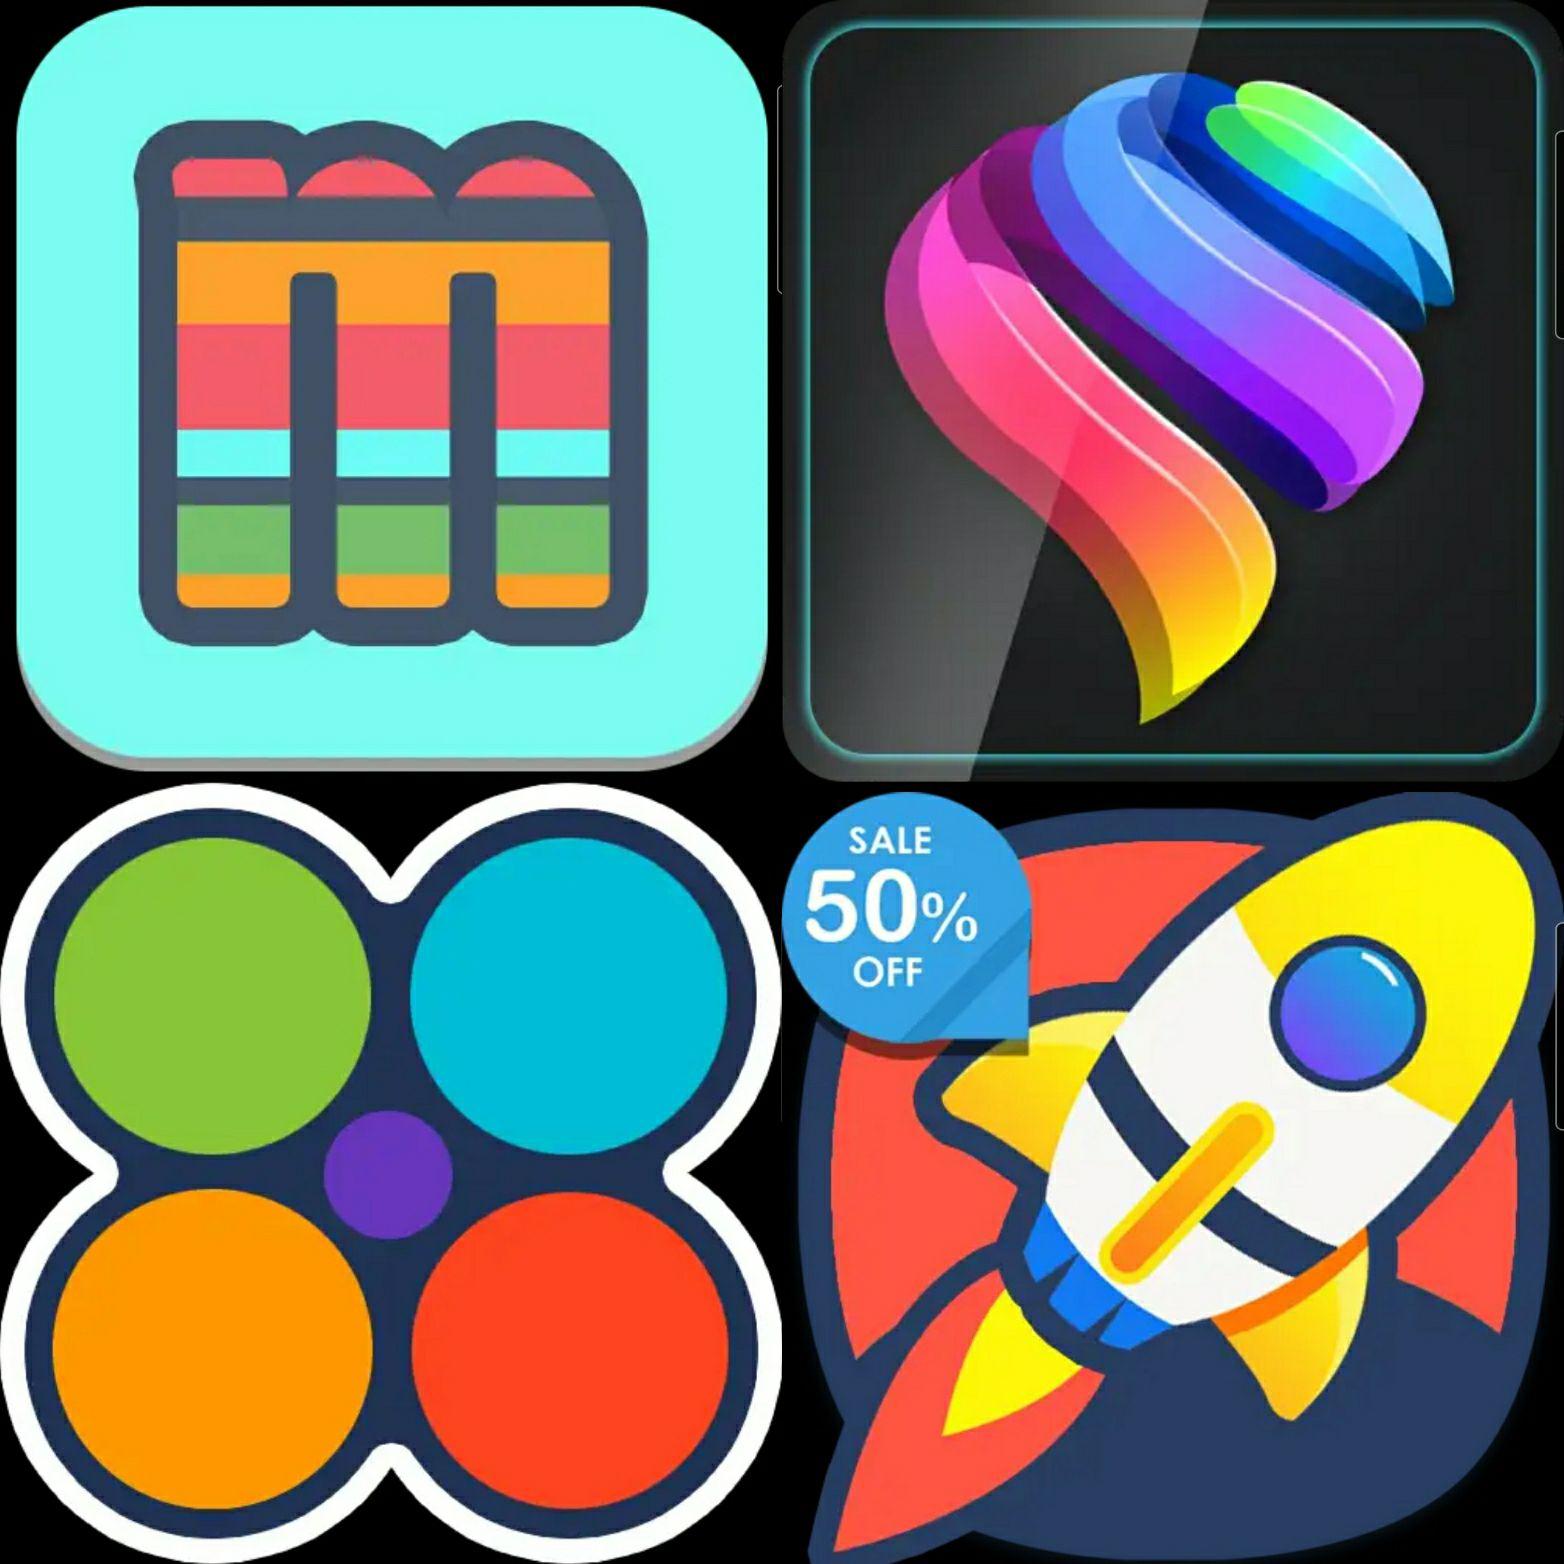 A1 design Icon Packs gratis